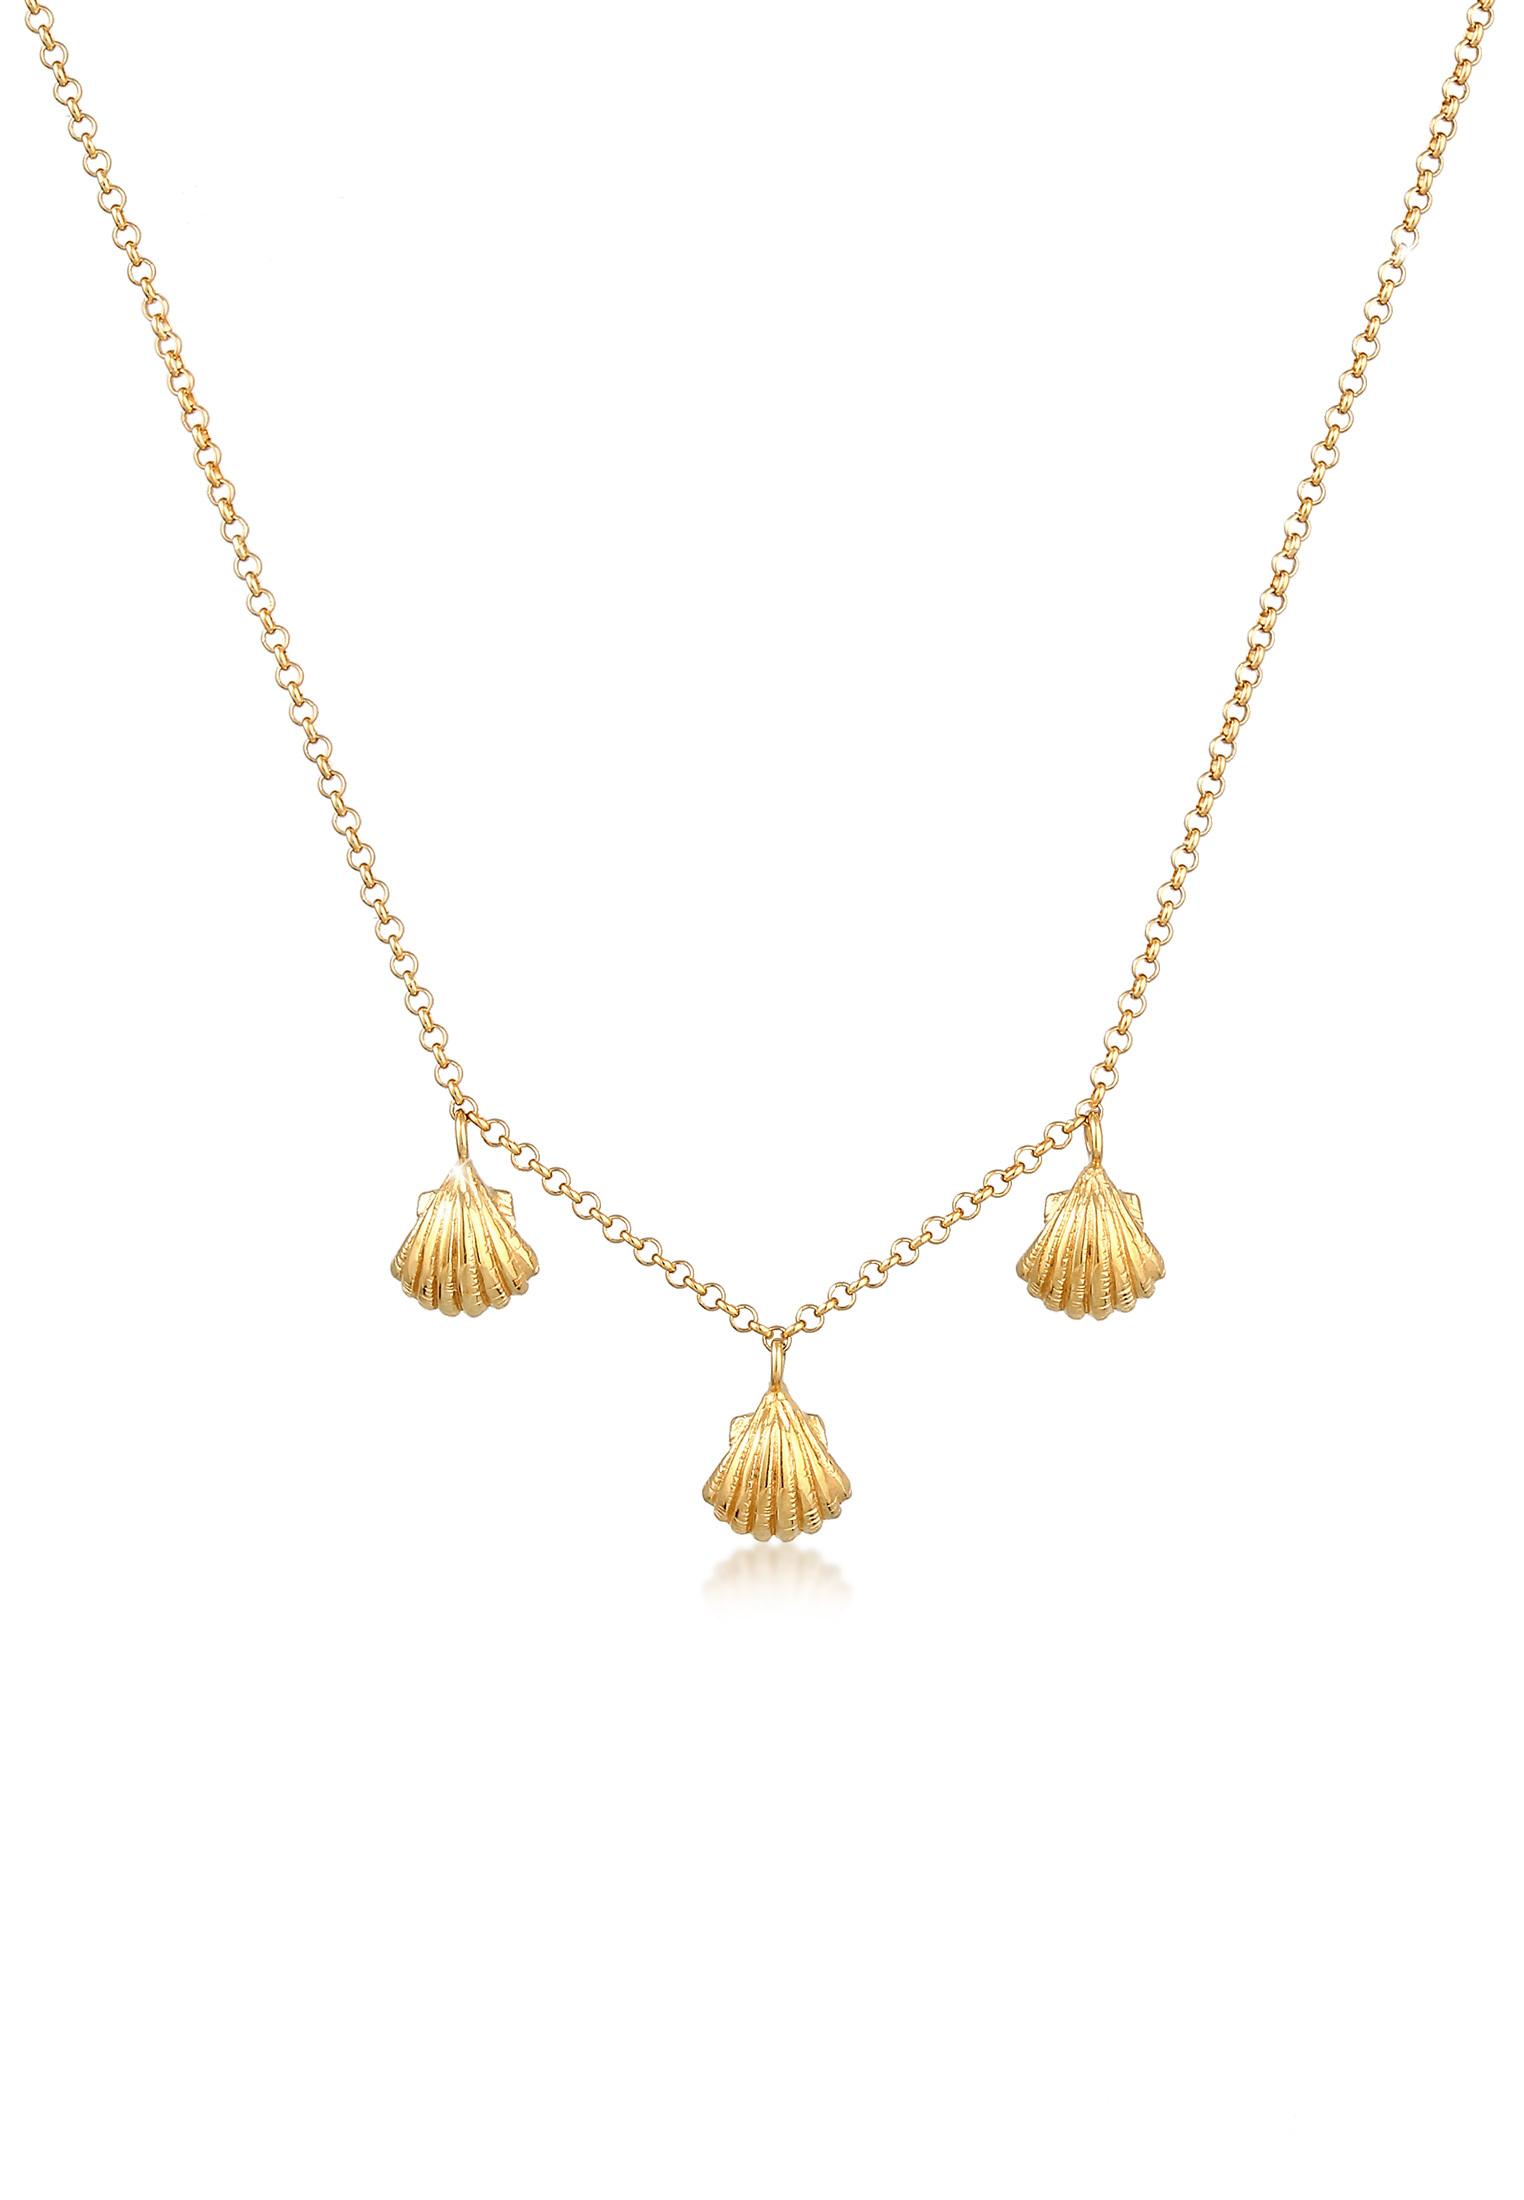 Halskette Muschel | 925 Sterling Silber vergoldet